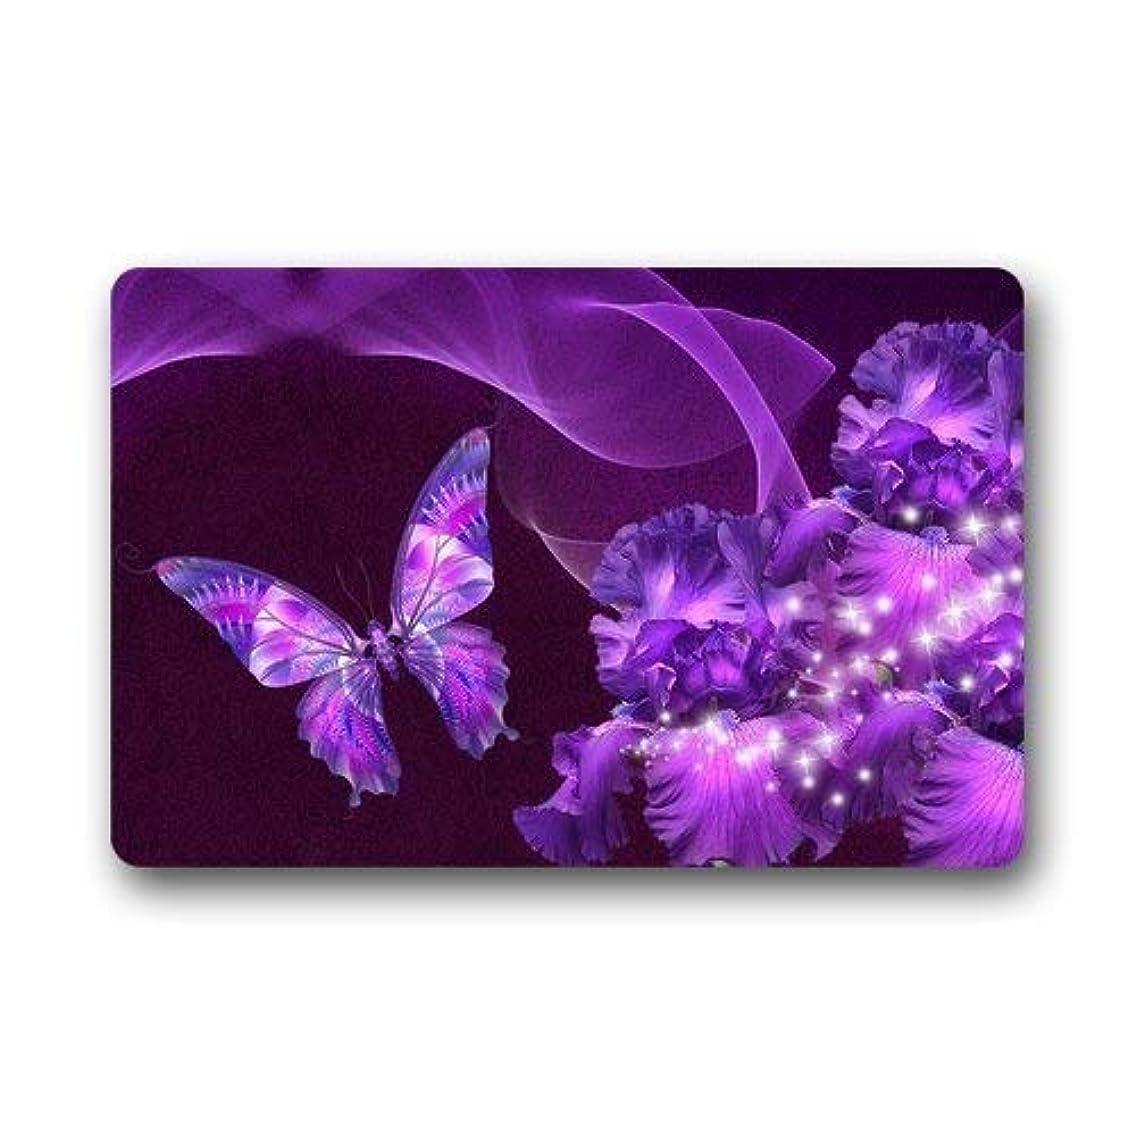 Usicapwear Custom Machine-Washable Door Mat Purple Butterfly and Flower Doormat 23.6 X 15.7 Inch(60x40cm)